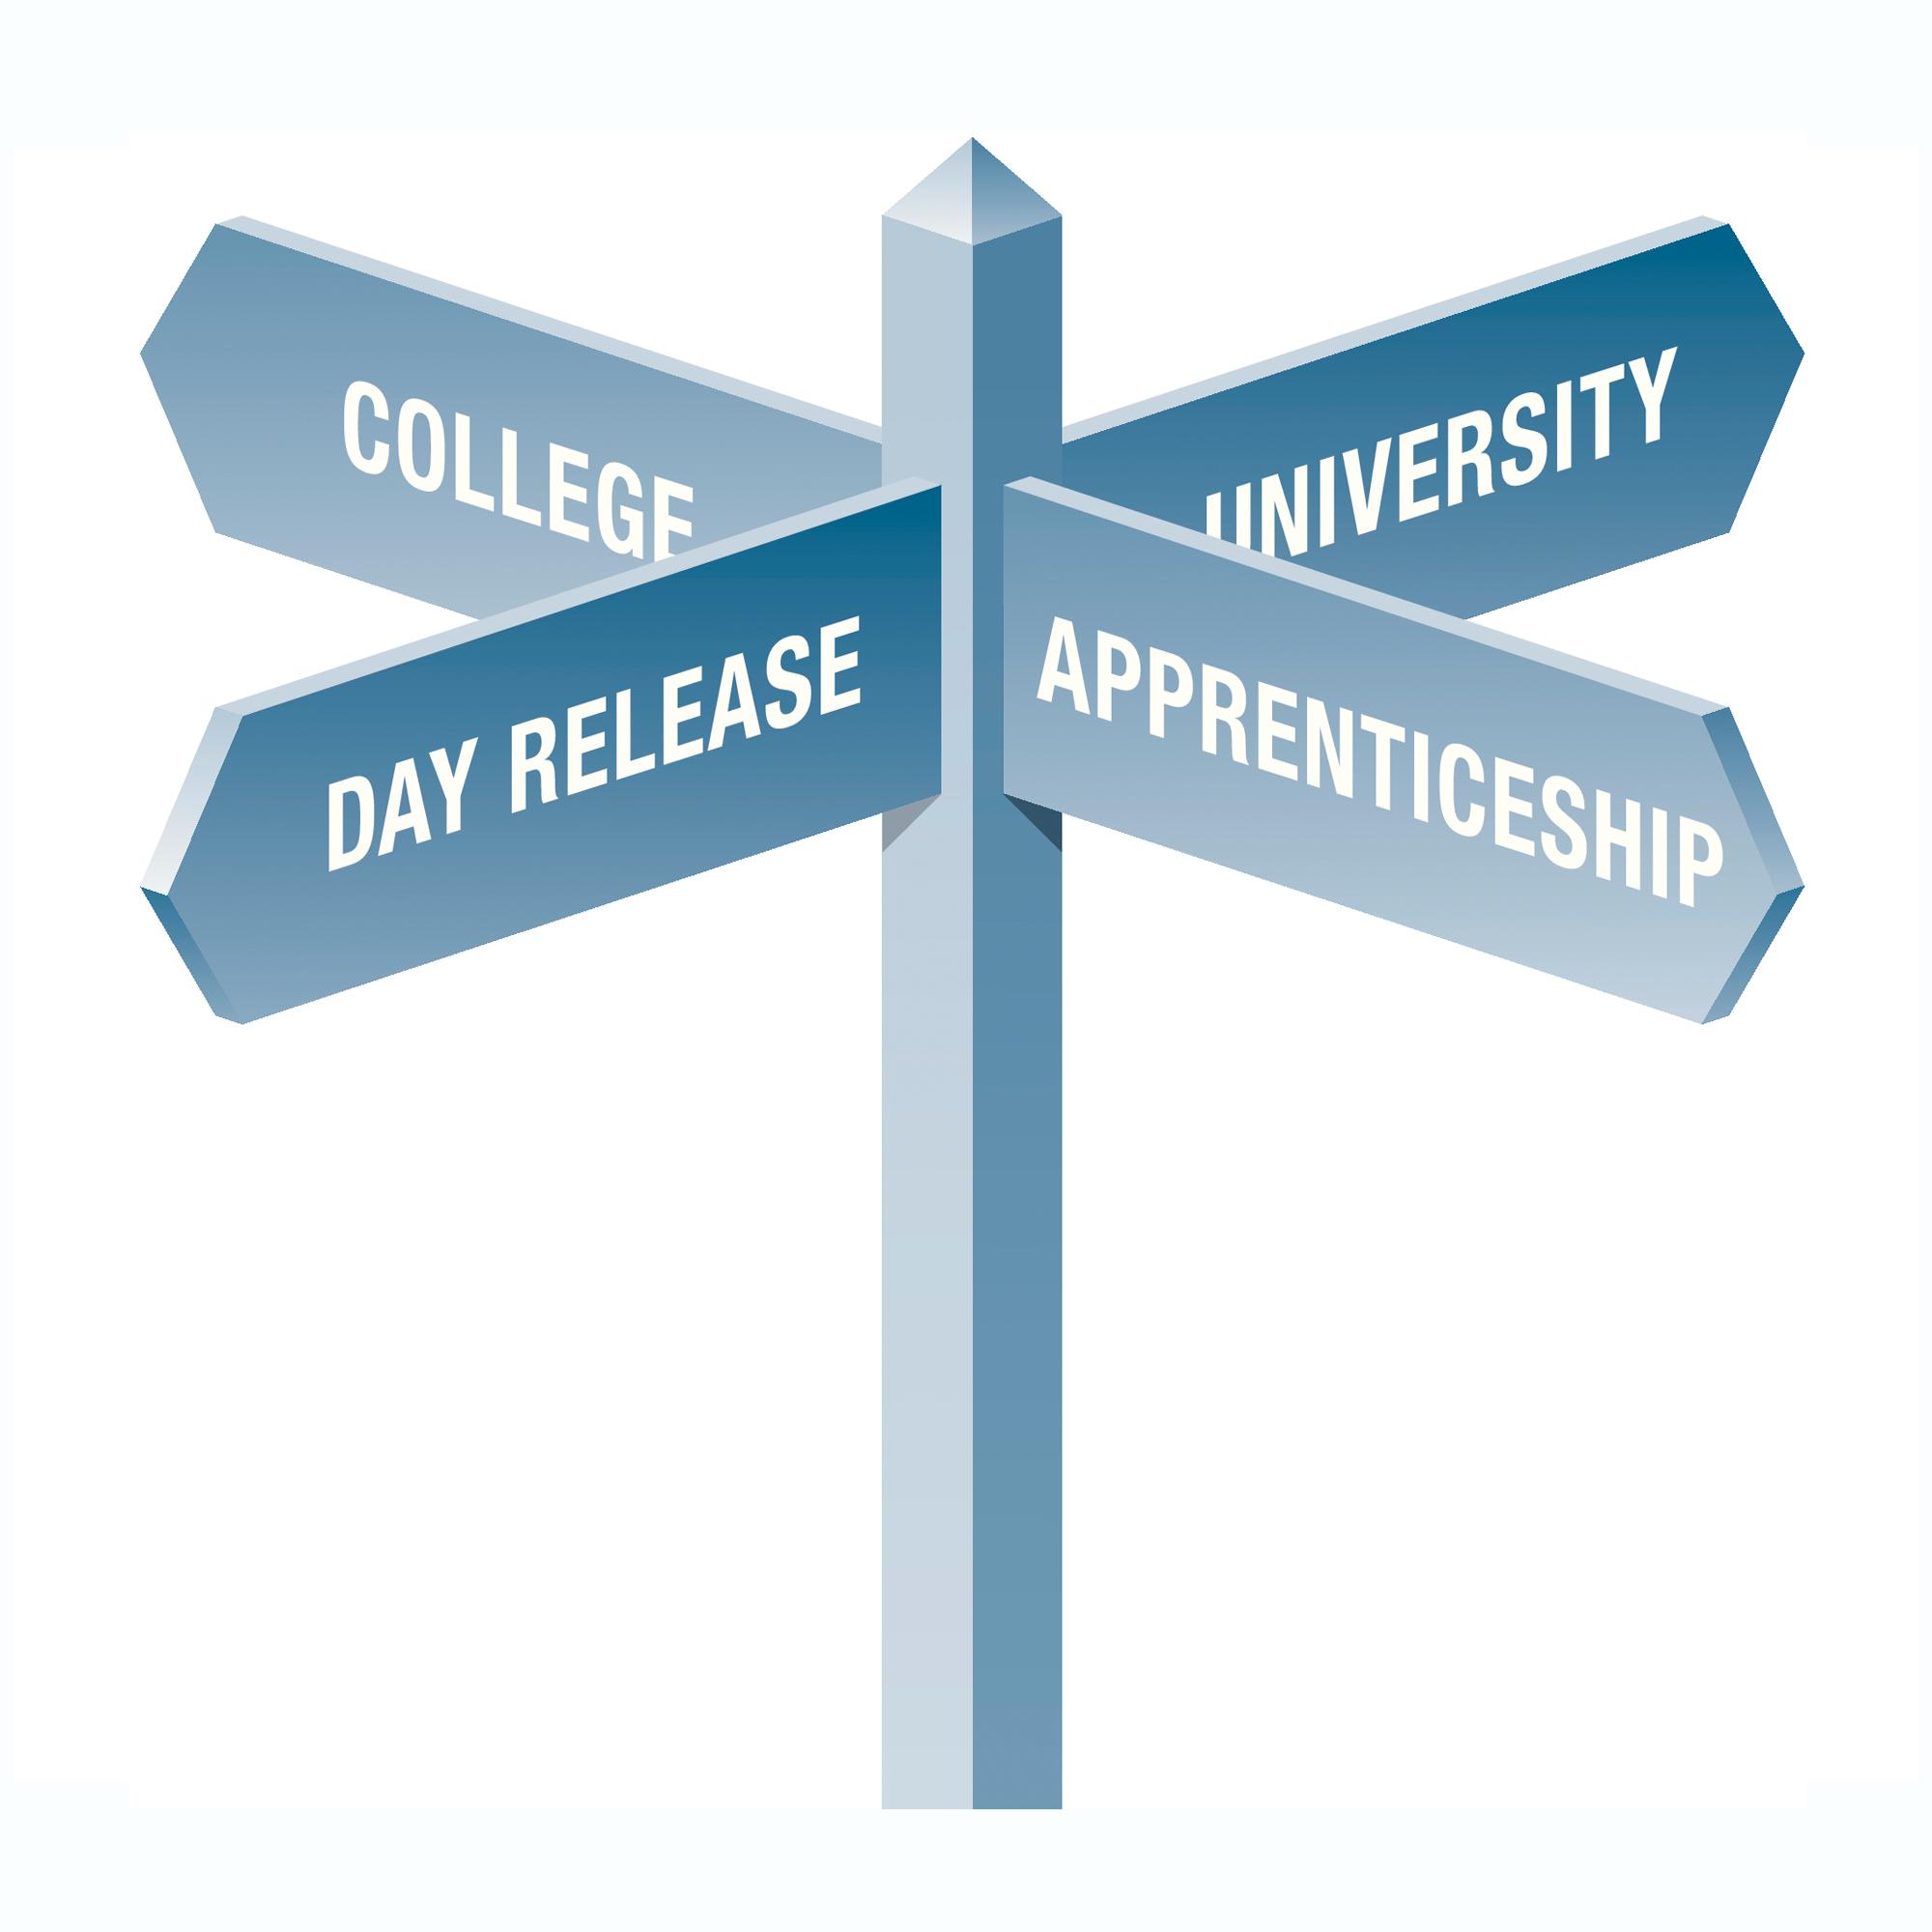 an image displaying career options on a sign post